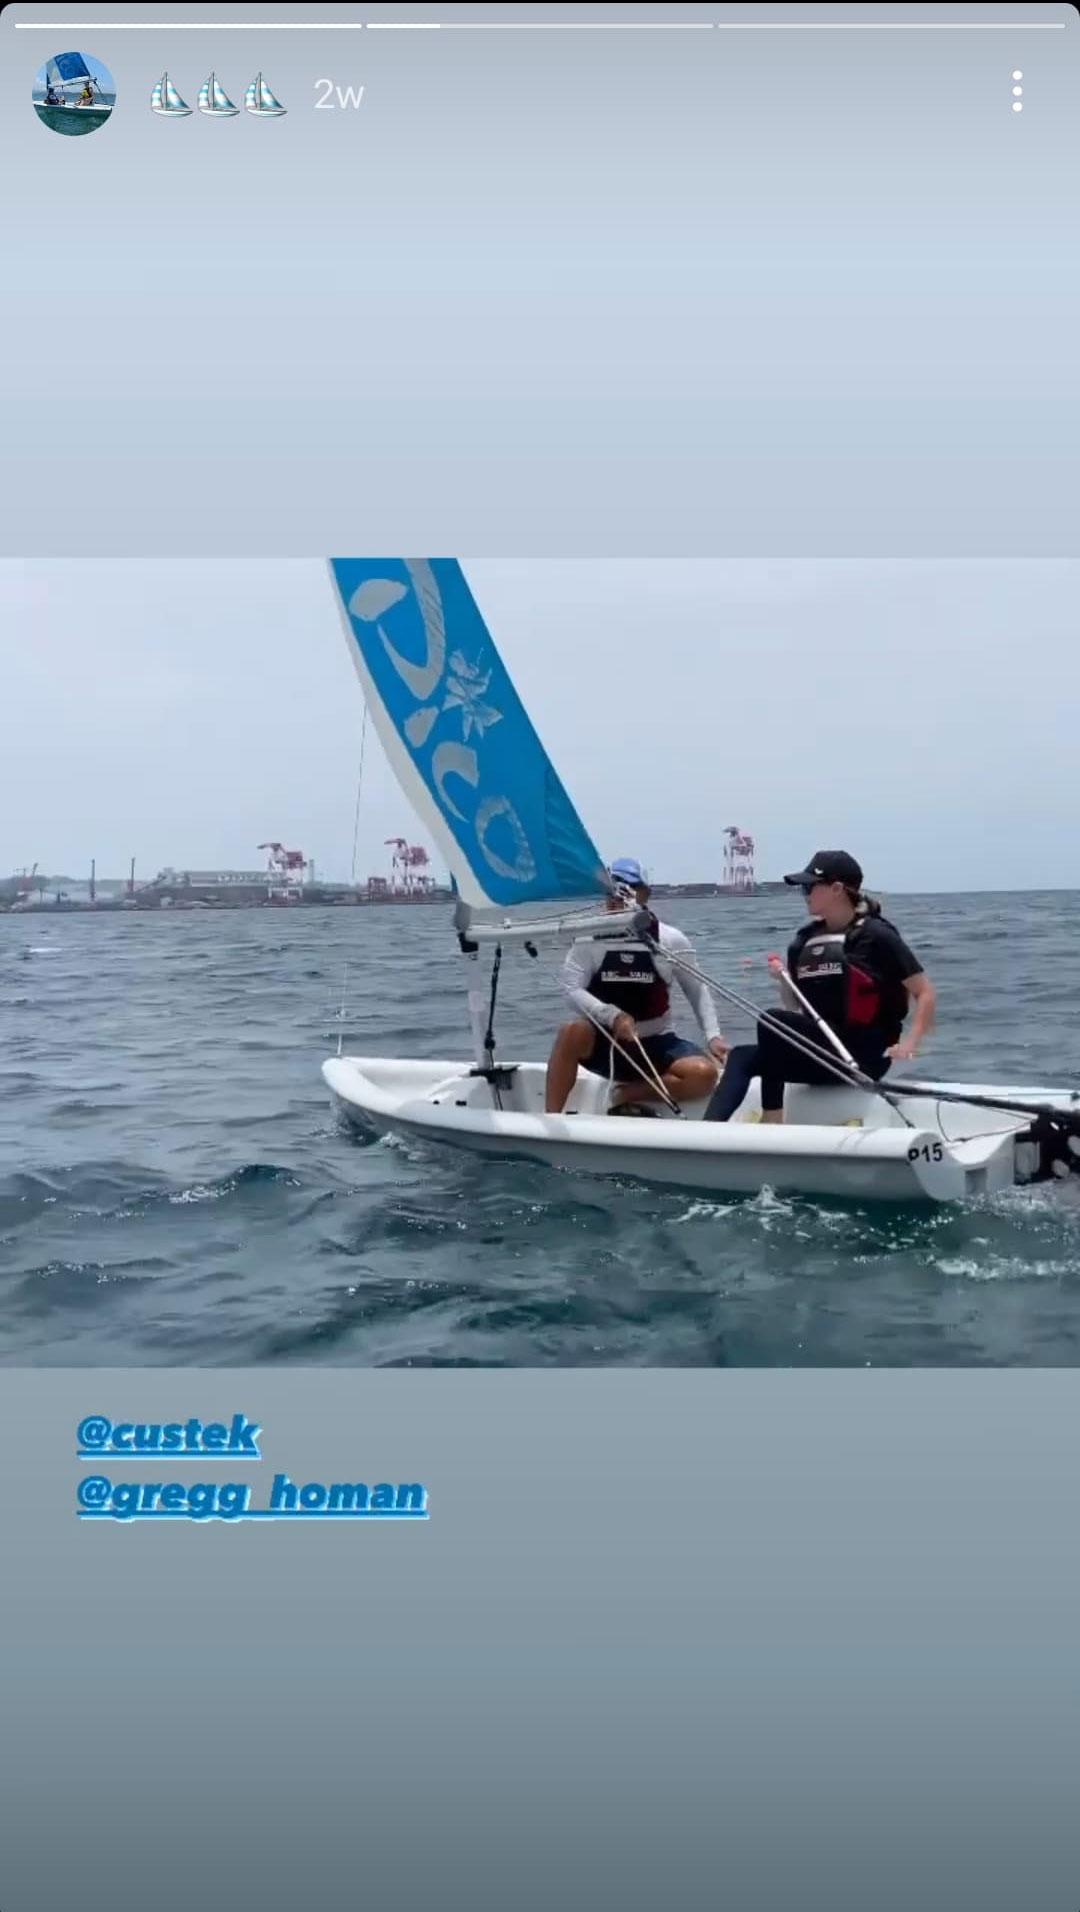 Gregg and Angelica Panganiban on a sailboat